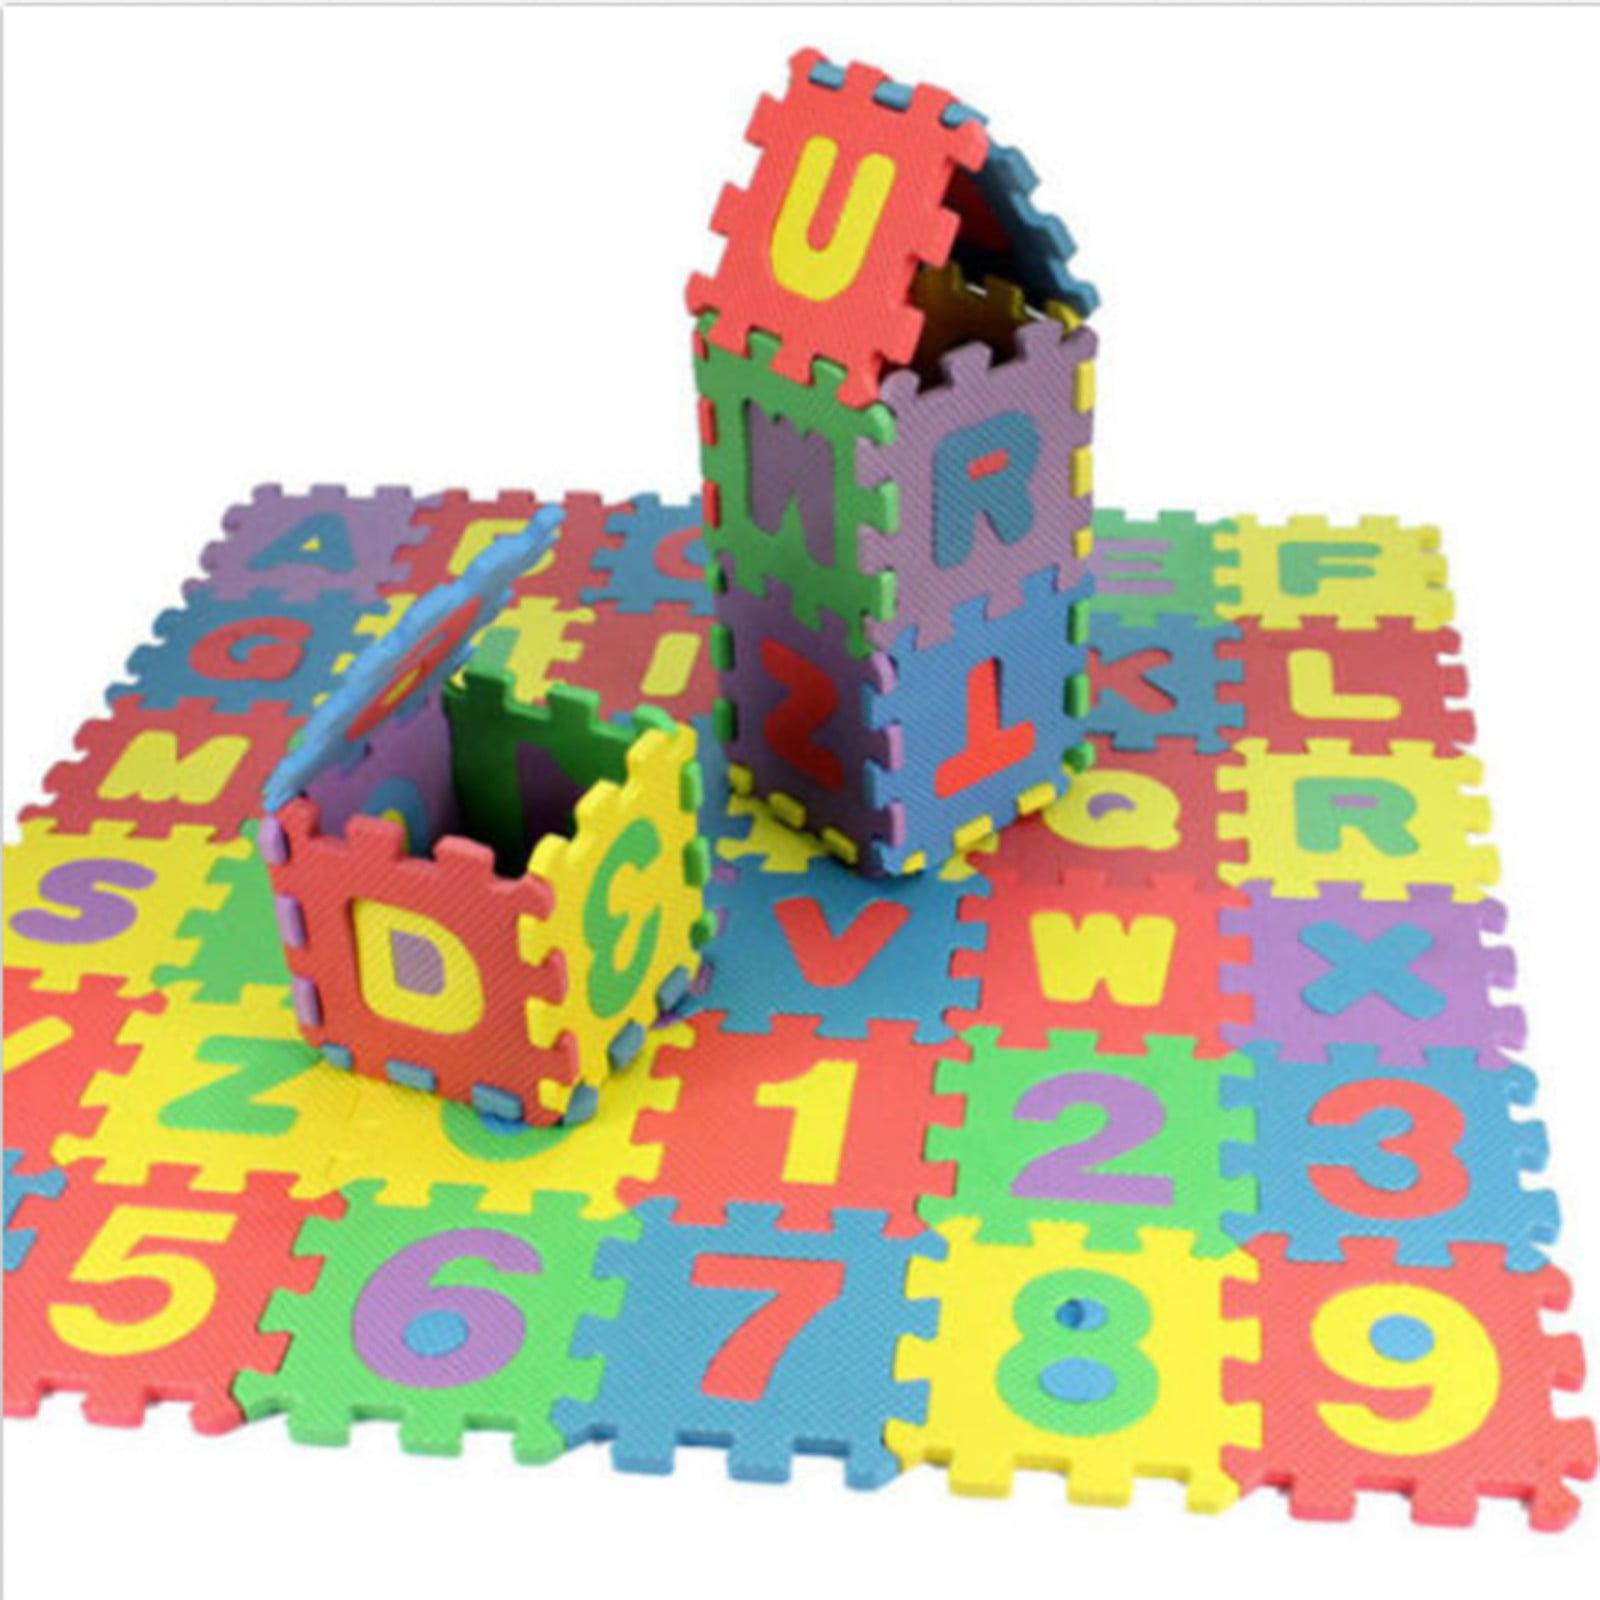 Jeobest Baby Puzzle Mat - Baby Foam Play Mat - Foam Puzzle Play Mat - 36PCS Mini Alphabet Number Baby Puzzle Pad Floor Mat Baby Play Mat Puzzle Eva Foam Floor Mat Home Decoration MZ